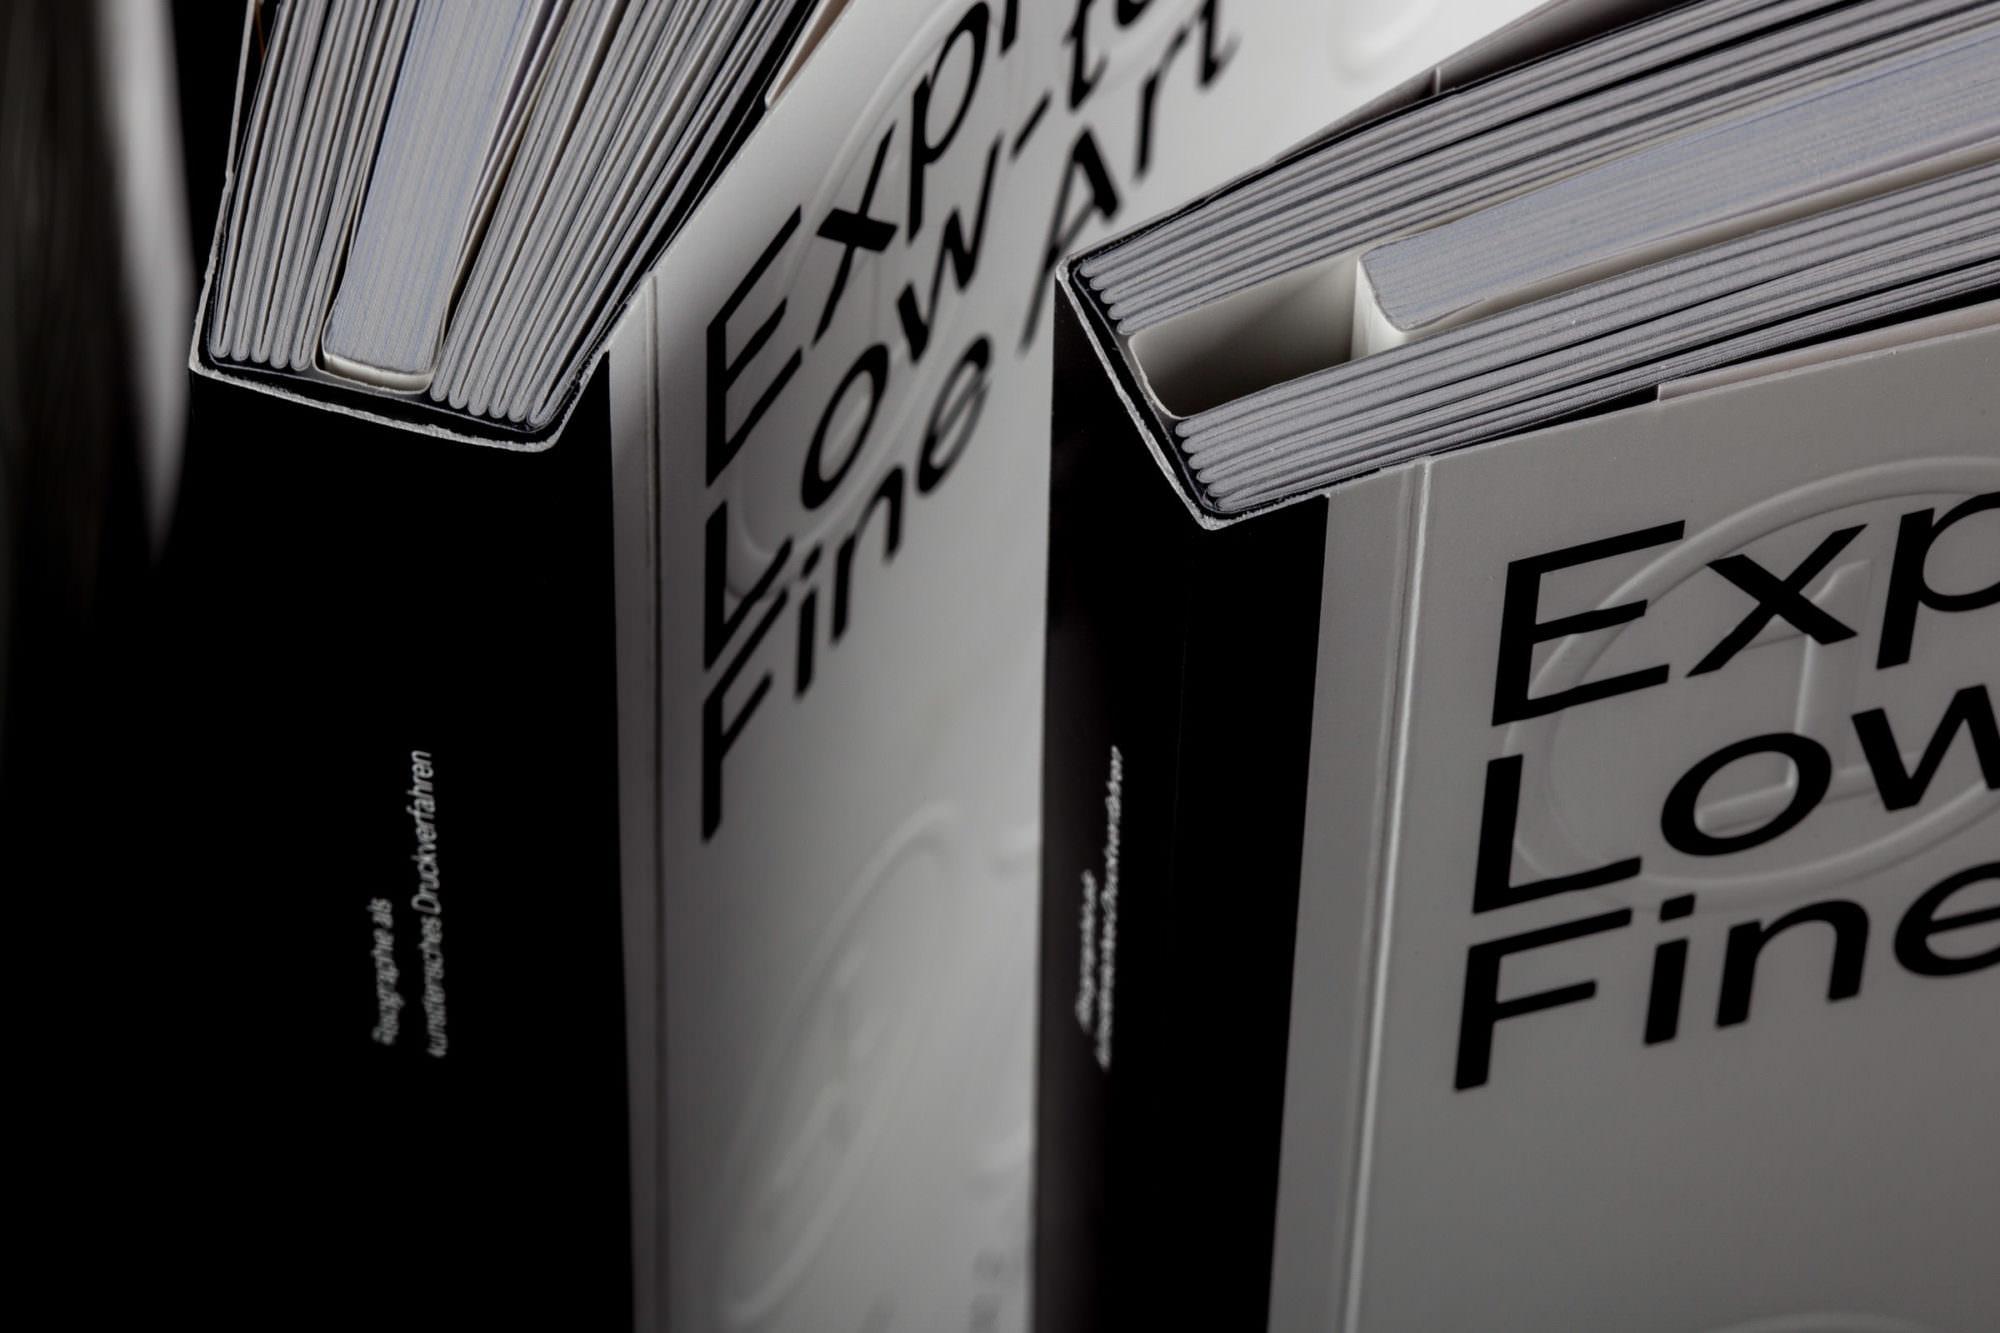 Buch »Exploriso: Low Tech Fine Art«, Buchbinderische Besonderheit des Book-In-Book.